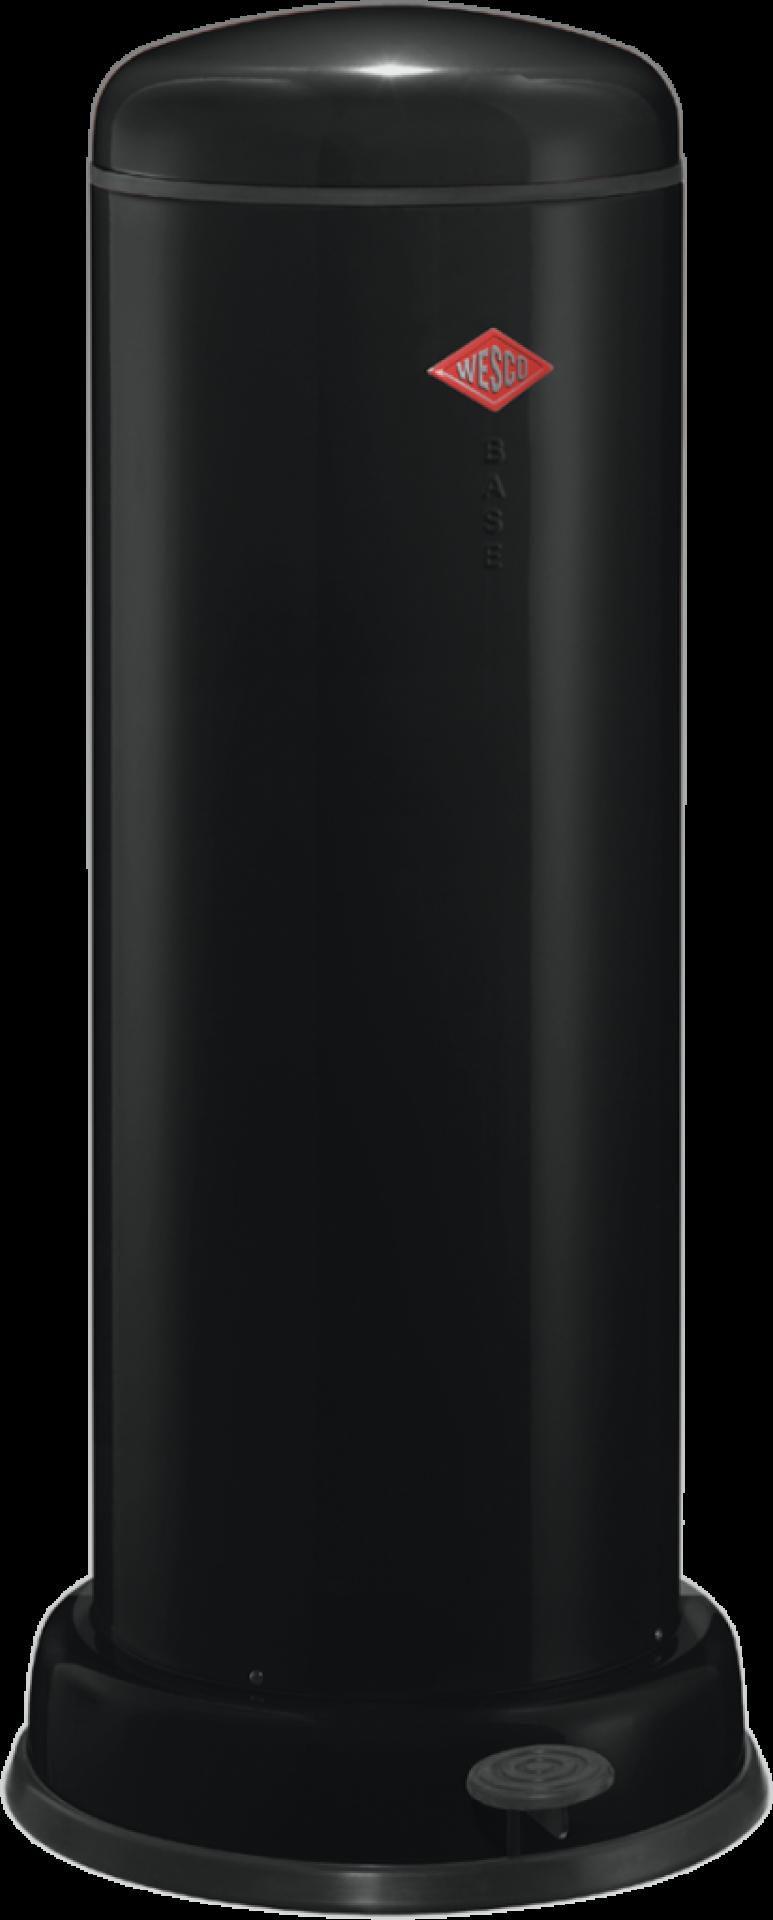 Baseboy 30 Liter Abfallsammler Wesco